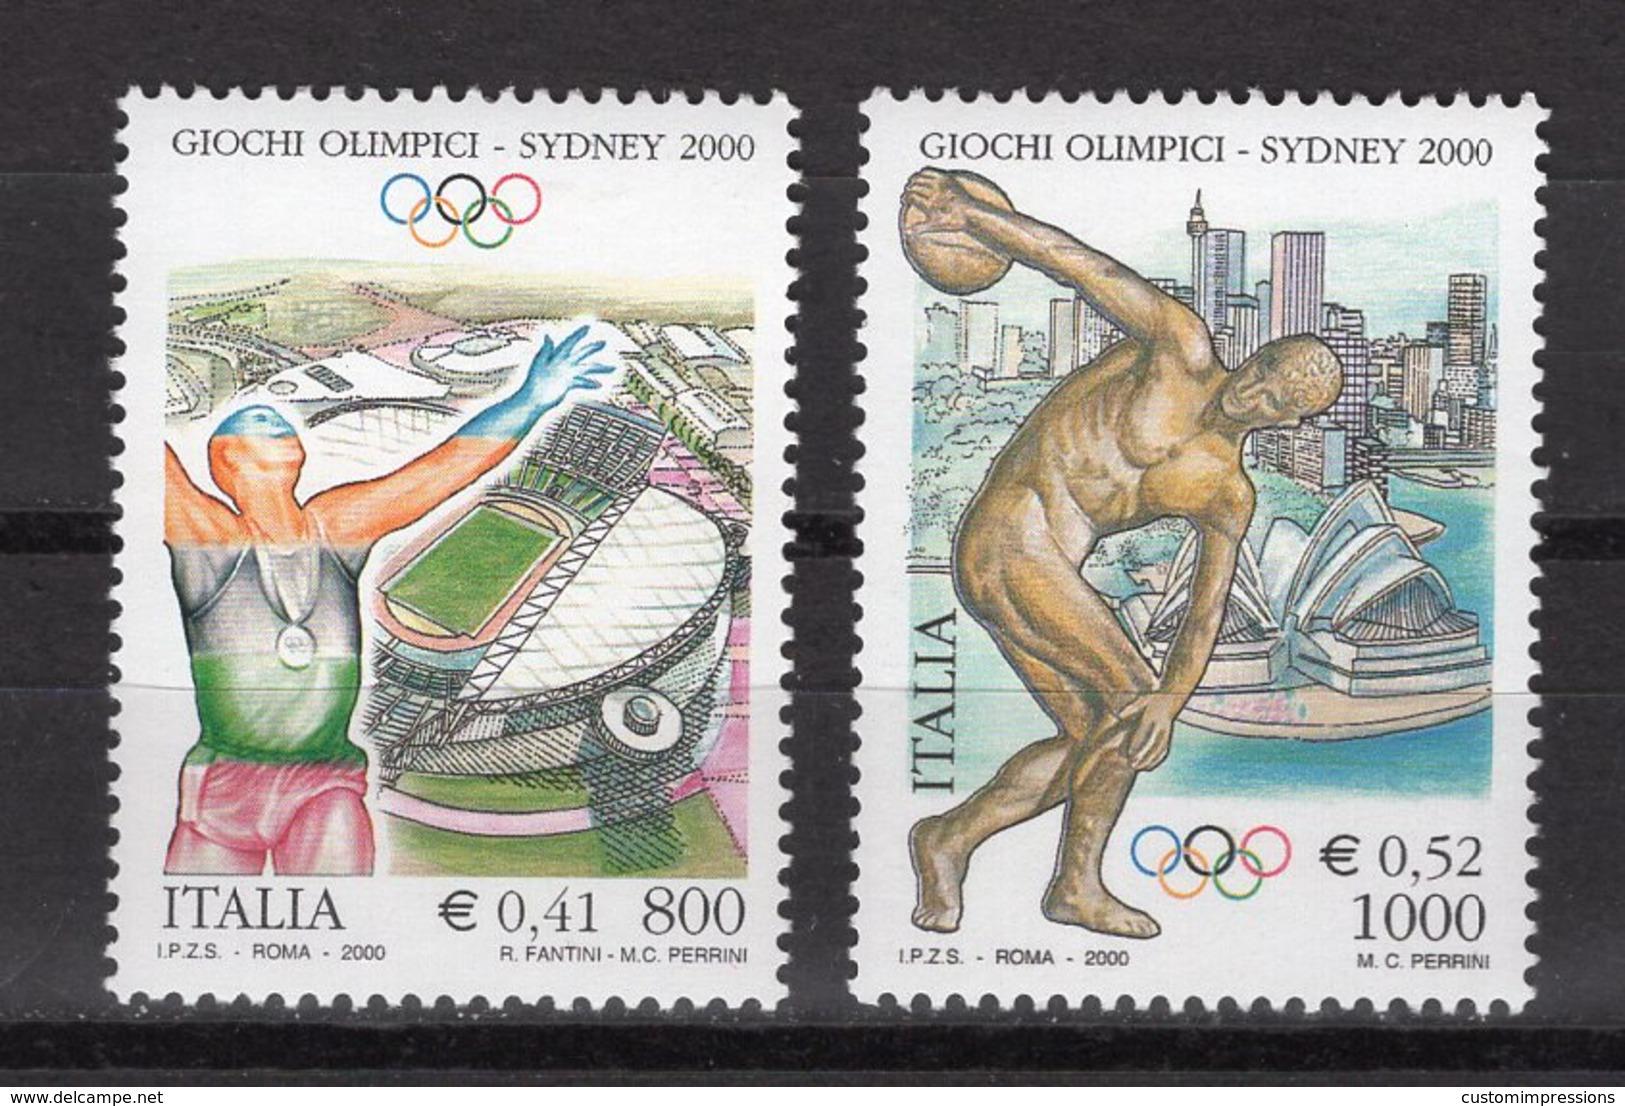 ITALY -  SYDNEY 2000 OLYMPIC GAMES  O541 - Sommer 2000: Sydney - Paralympics